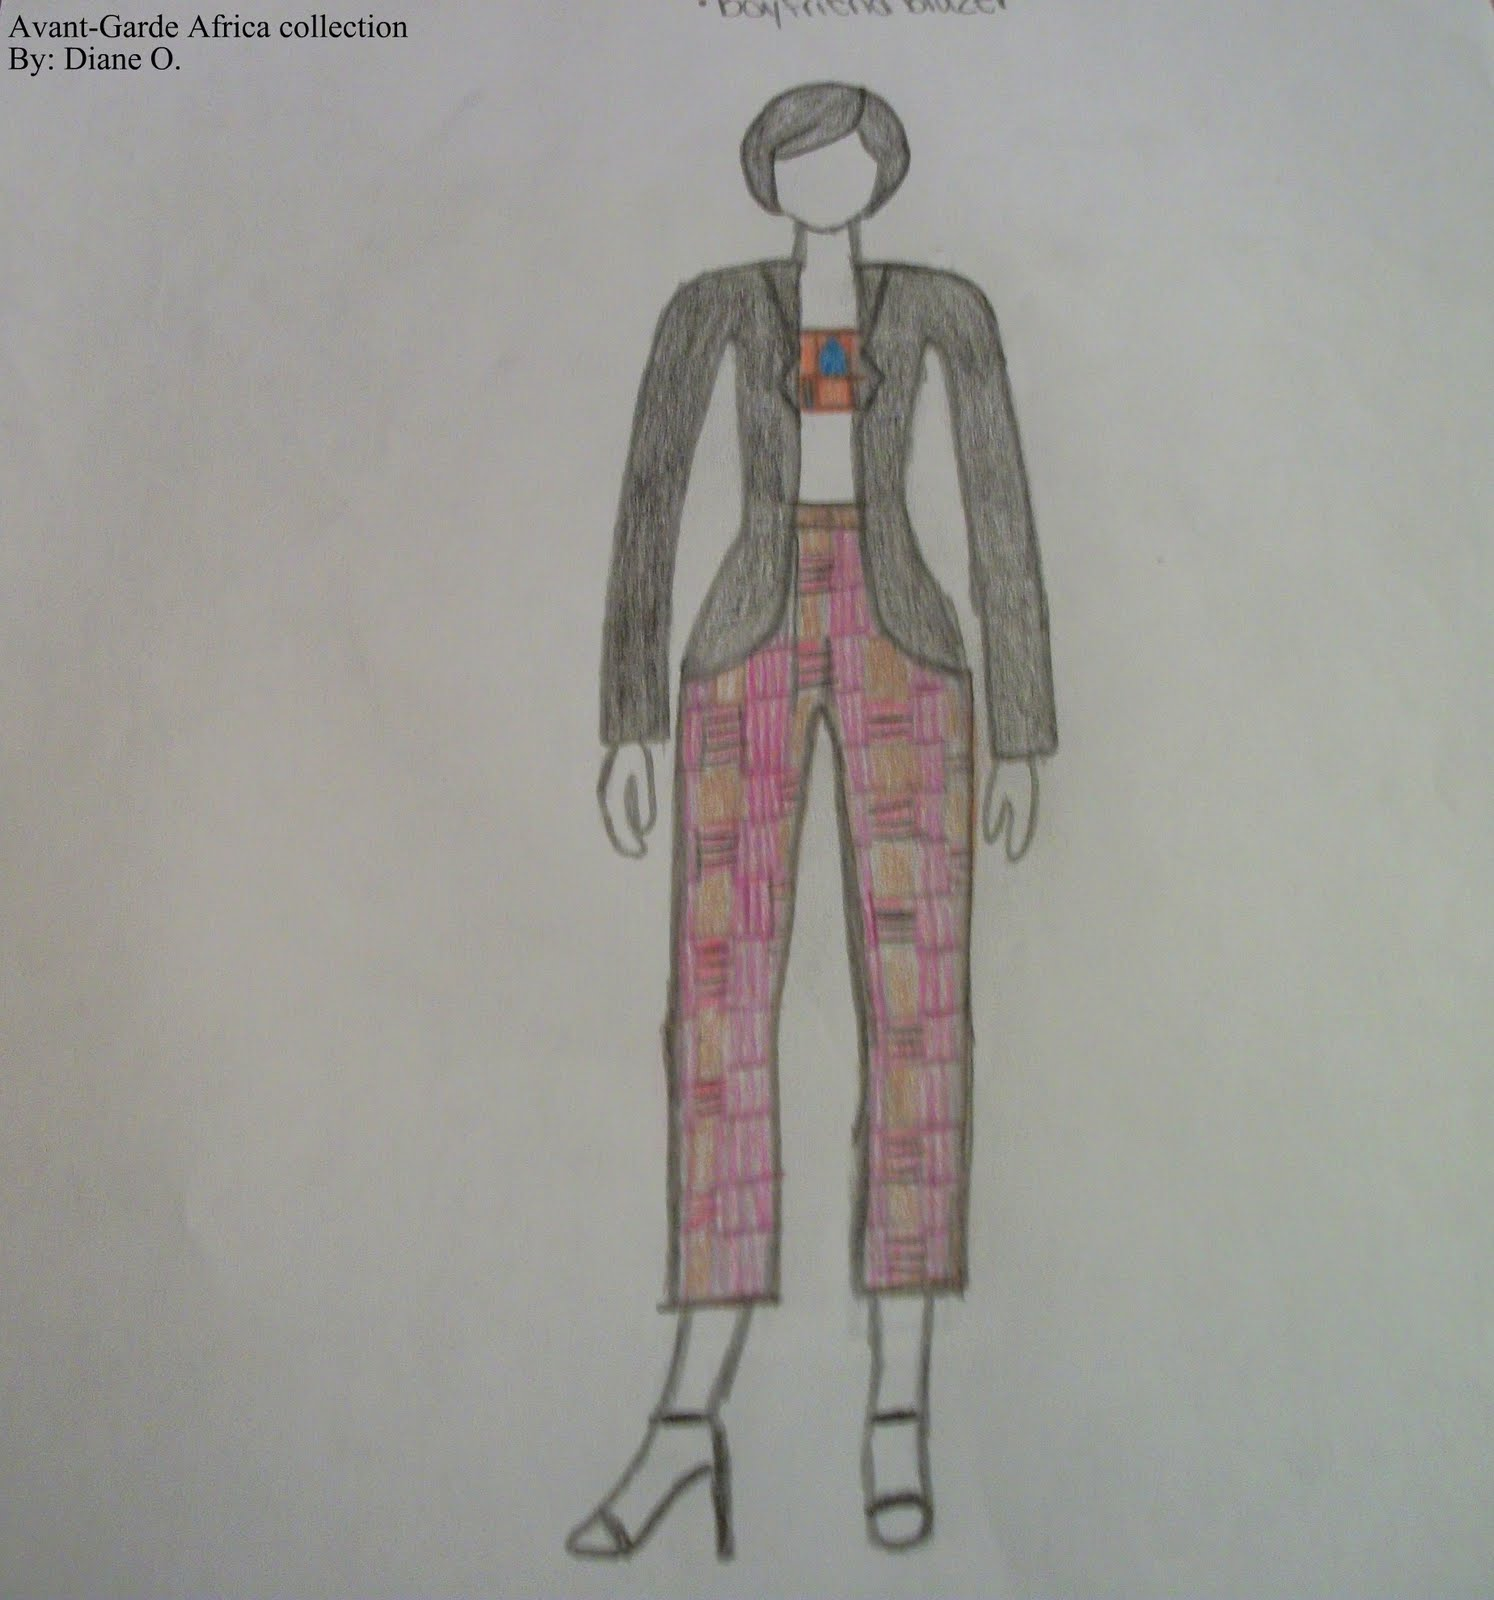 http://3.bp.blogspot.com/-z7dukkyVU-Q/TeOdG04zqcI/AAAAAAAAAbM/V3jNNQgDRJY/s1600/Picture+002.jpg